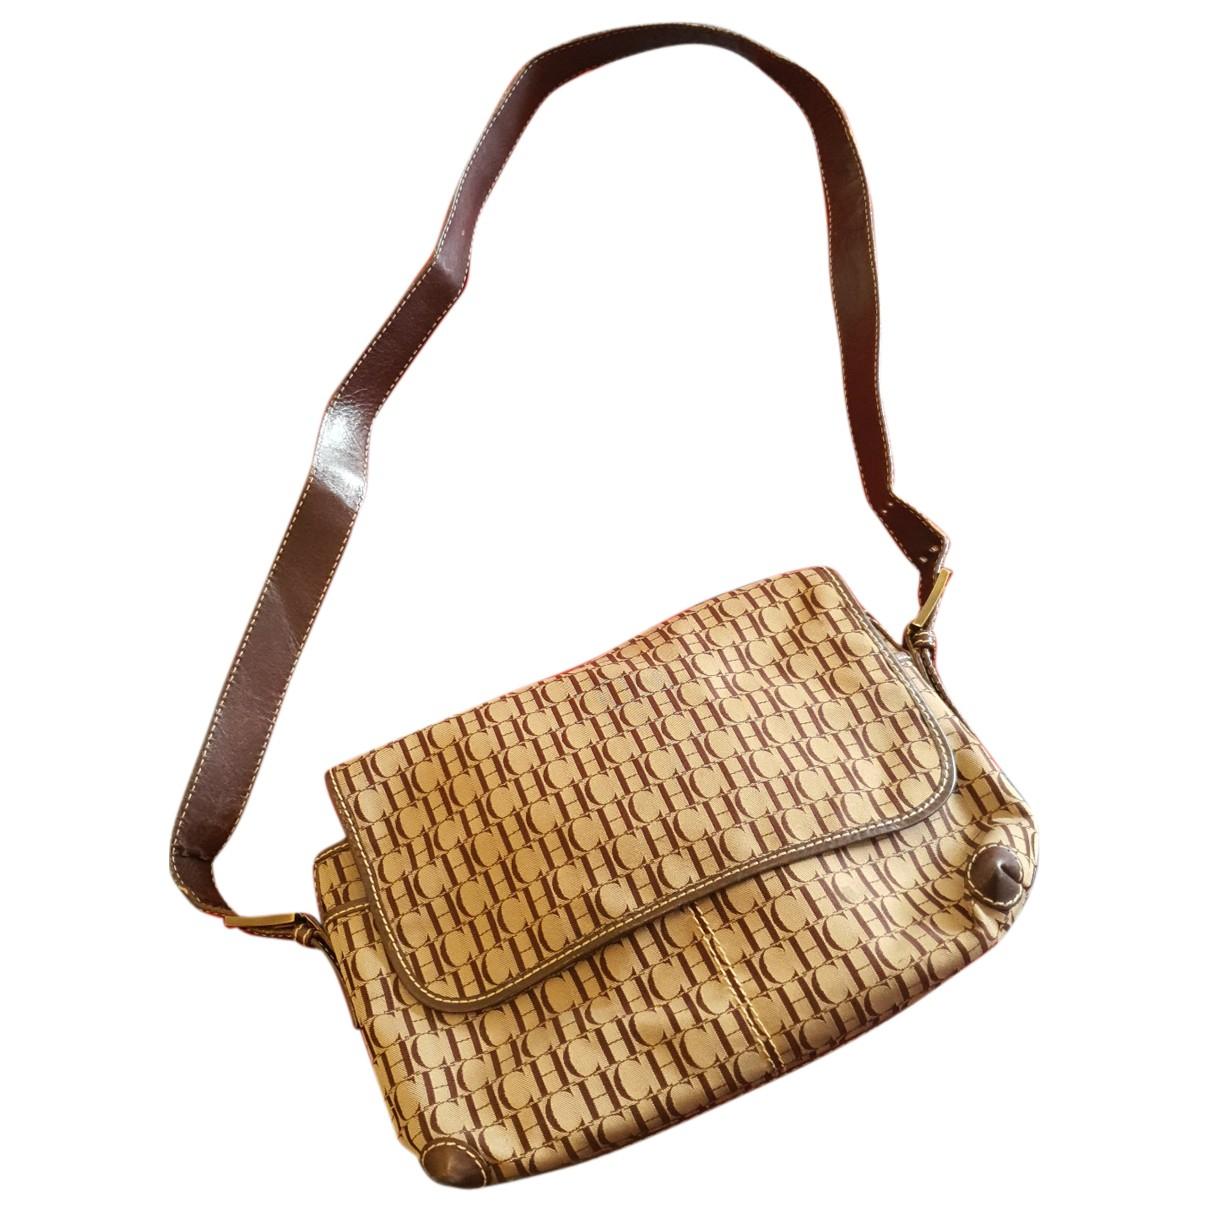 Carolina Herrera N Brown Cloth handbag for Women N